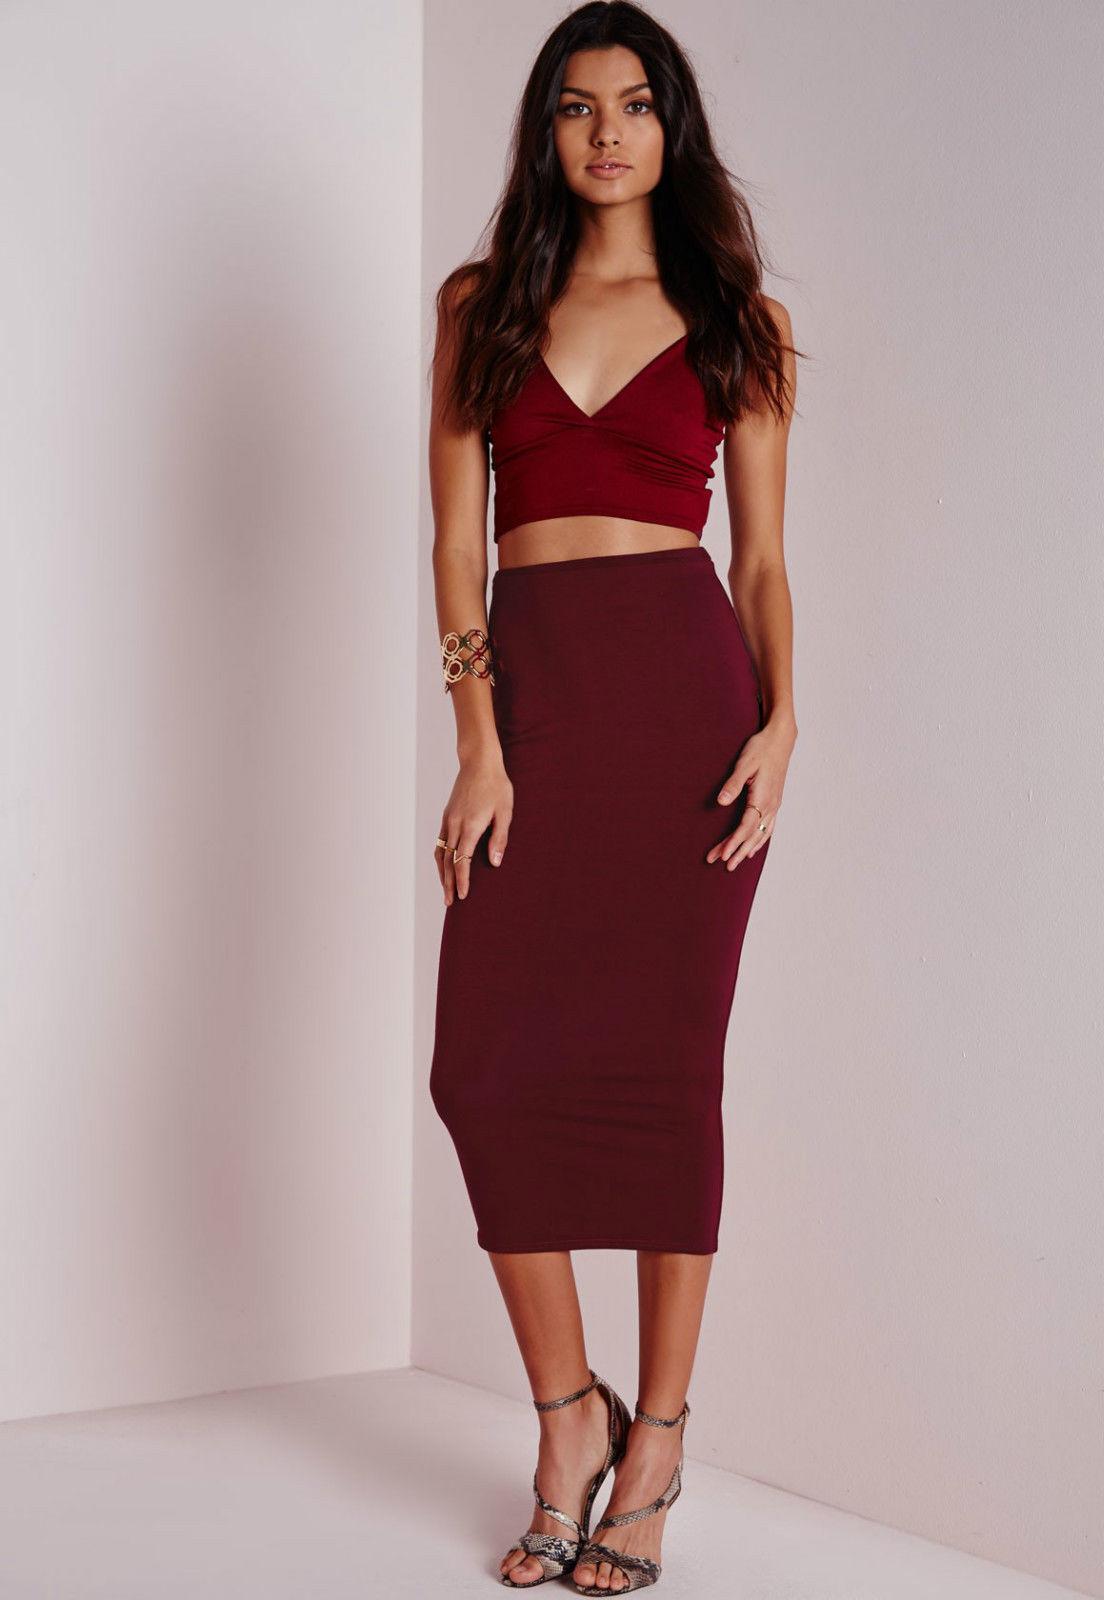 Modischer DaMännerrock rot   bordeaux - Kim Kardashian Stil - 34   XS - NEU